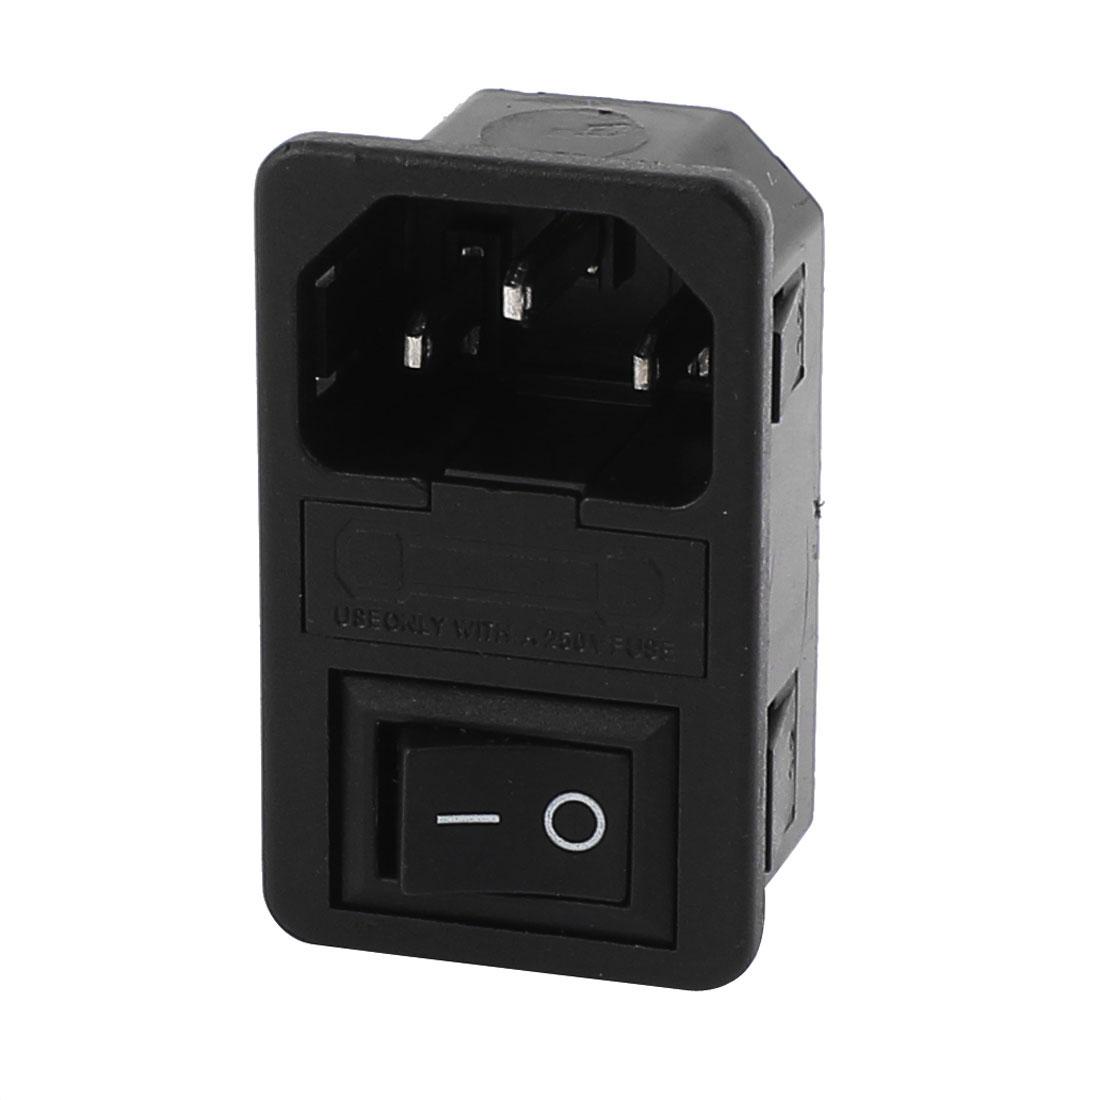 AC 250V 10A 3 Terminals Black Rocker Switch I/O Inlet Power Socket w Fuse Holder